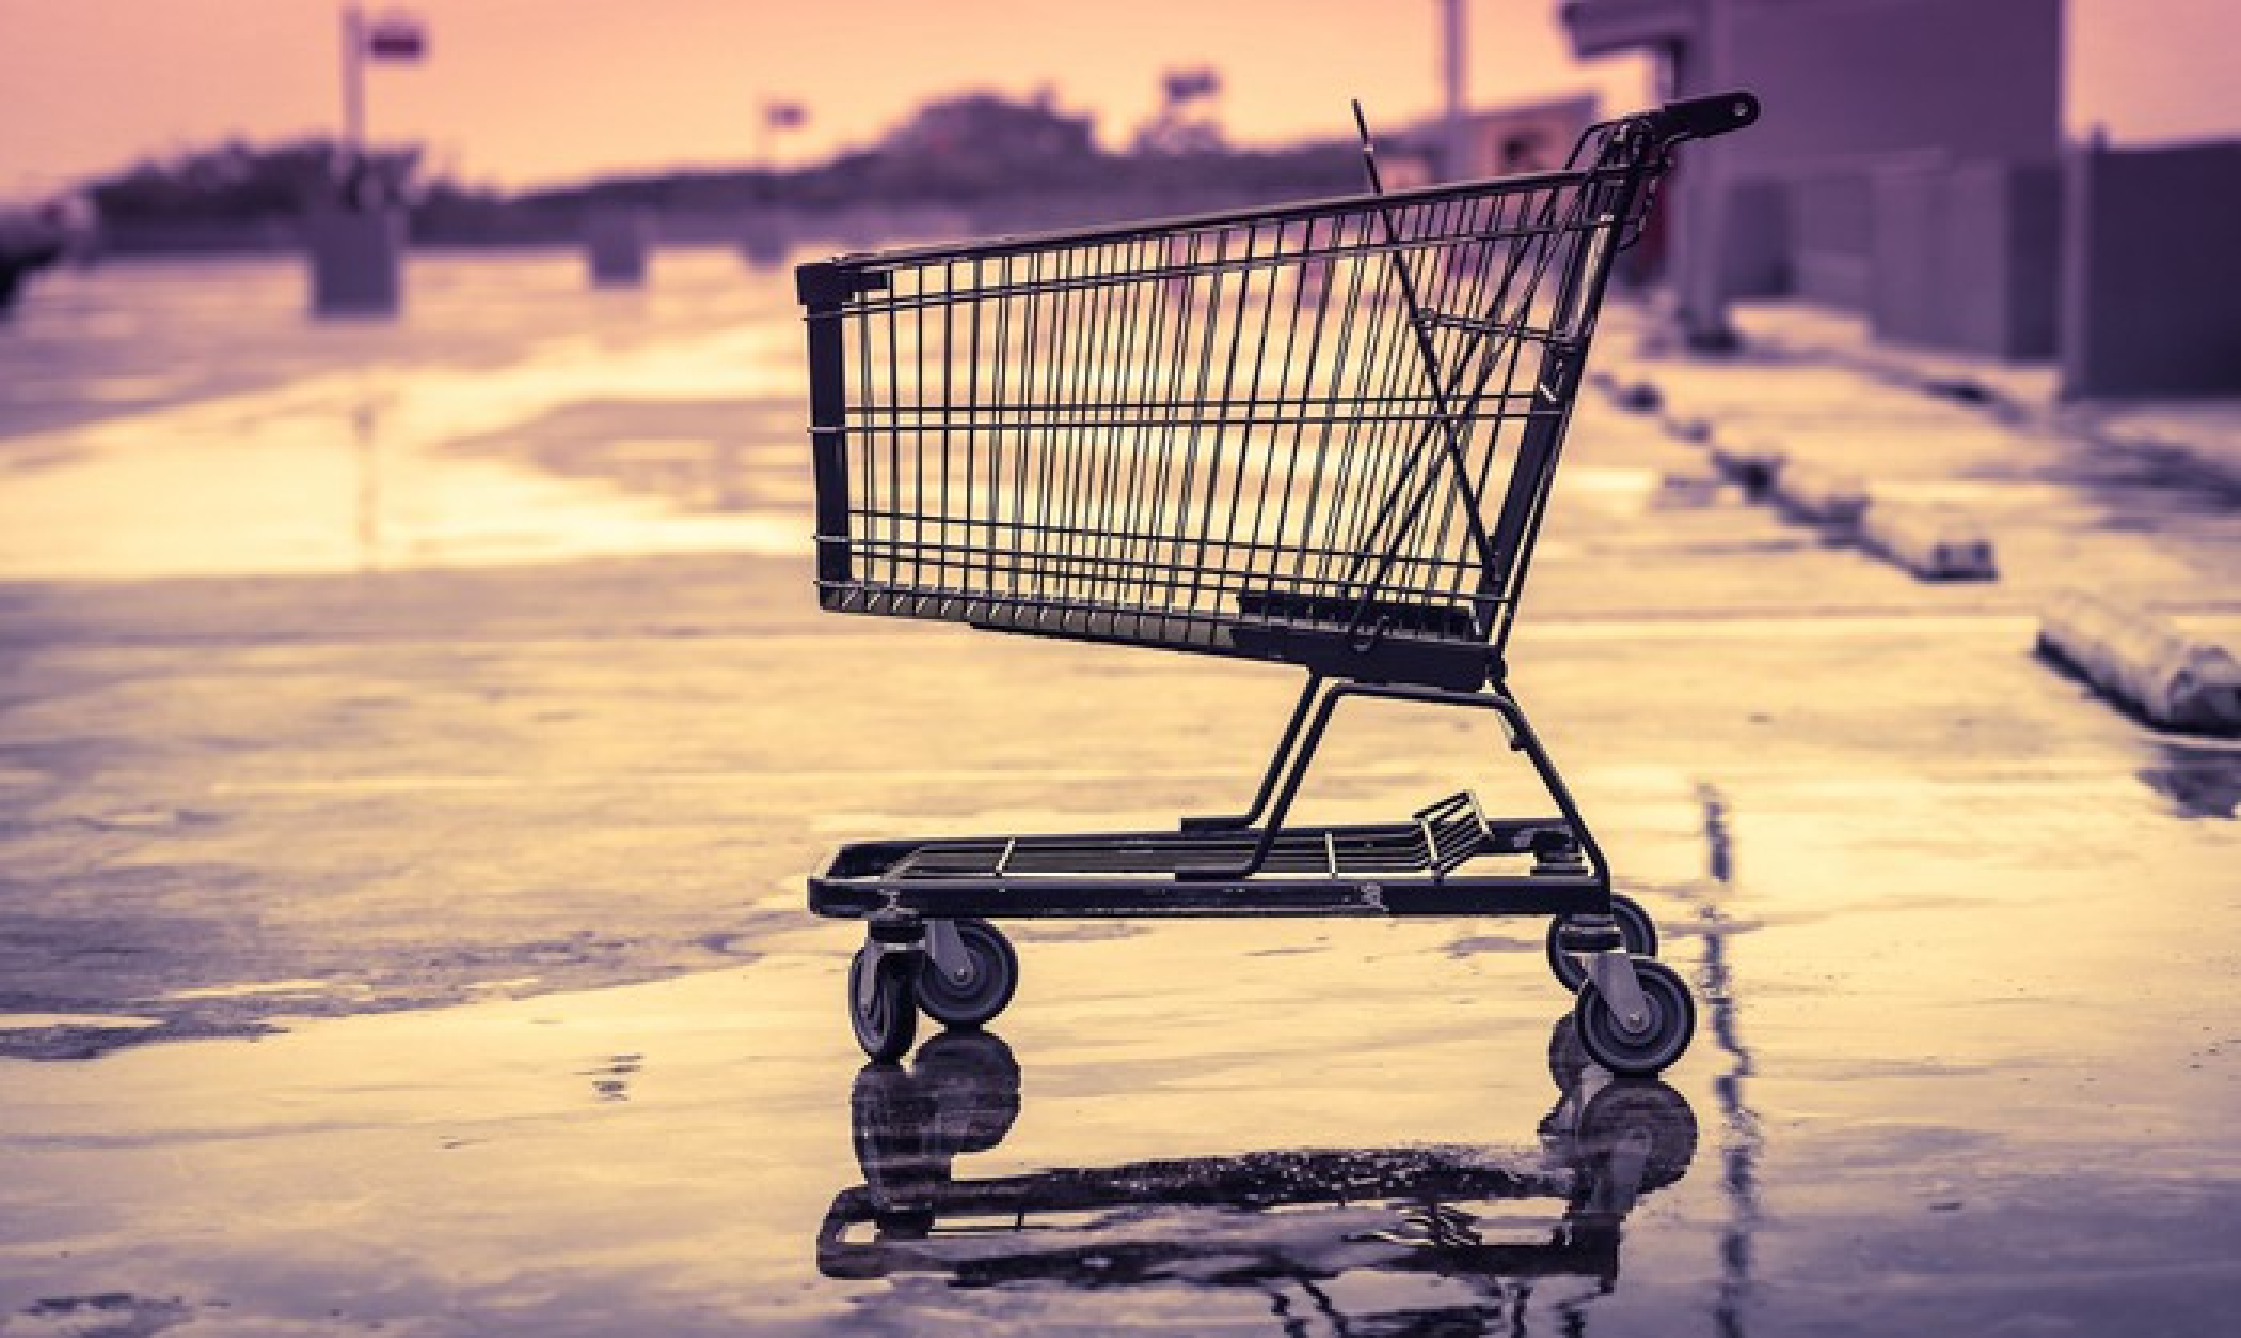 An empty shopping cart in an empty store parking lot